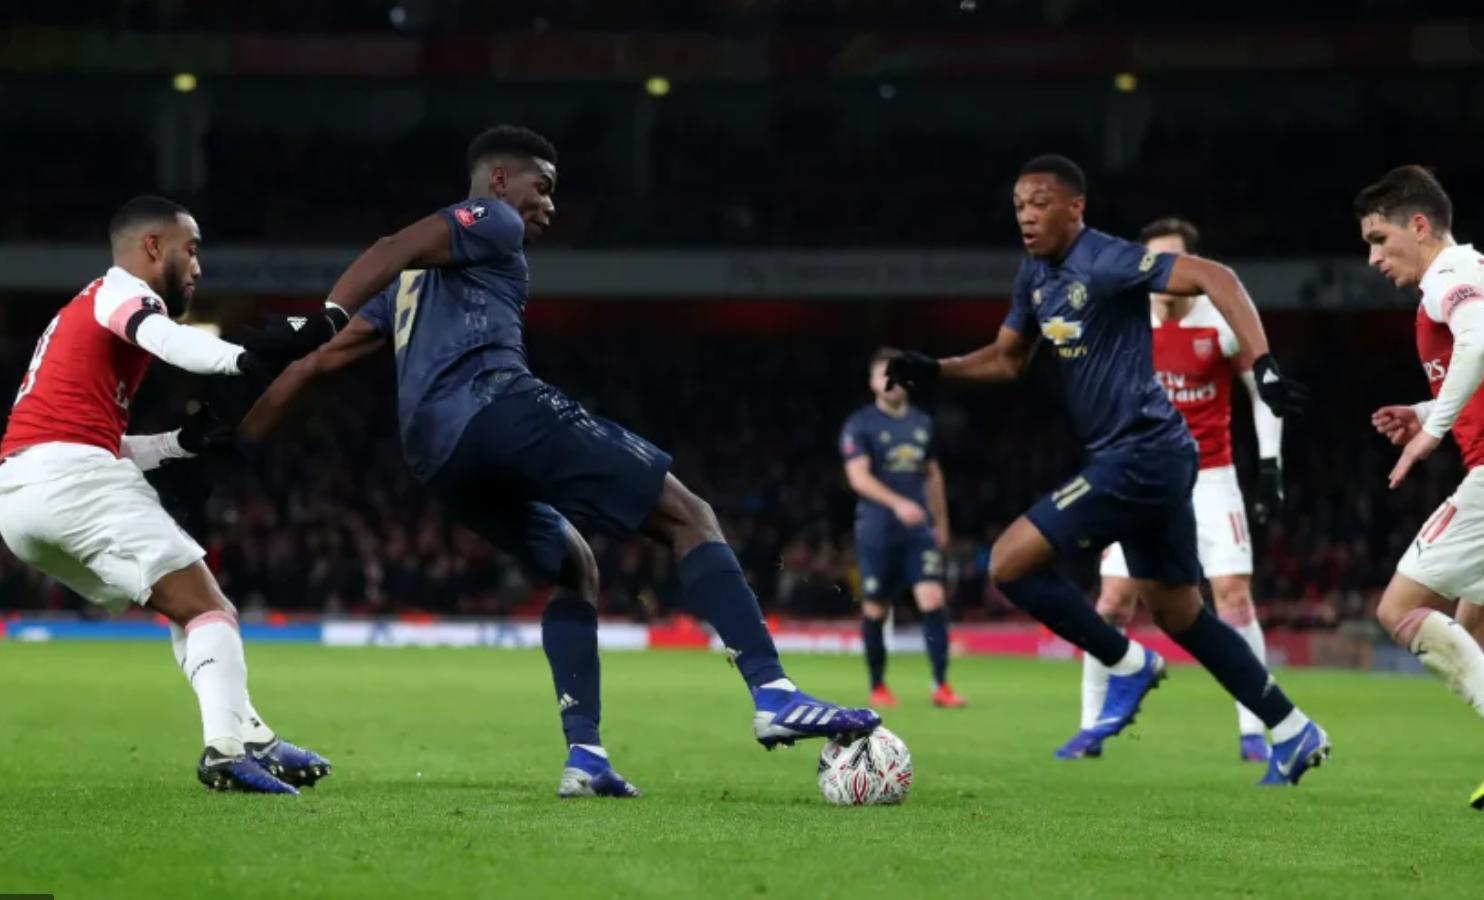 Man Utd Vs Arsenal: EPL Rivalry Renewed Tonight